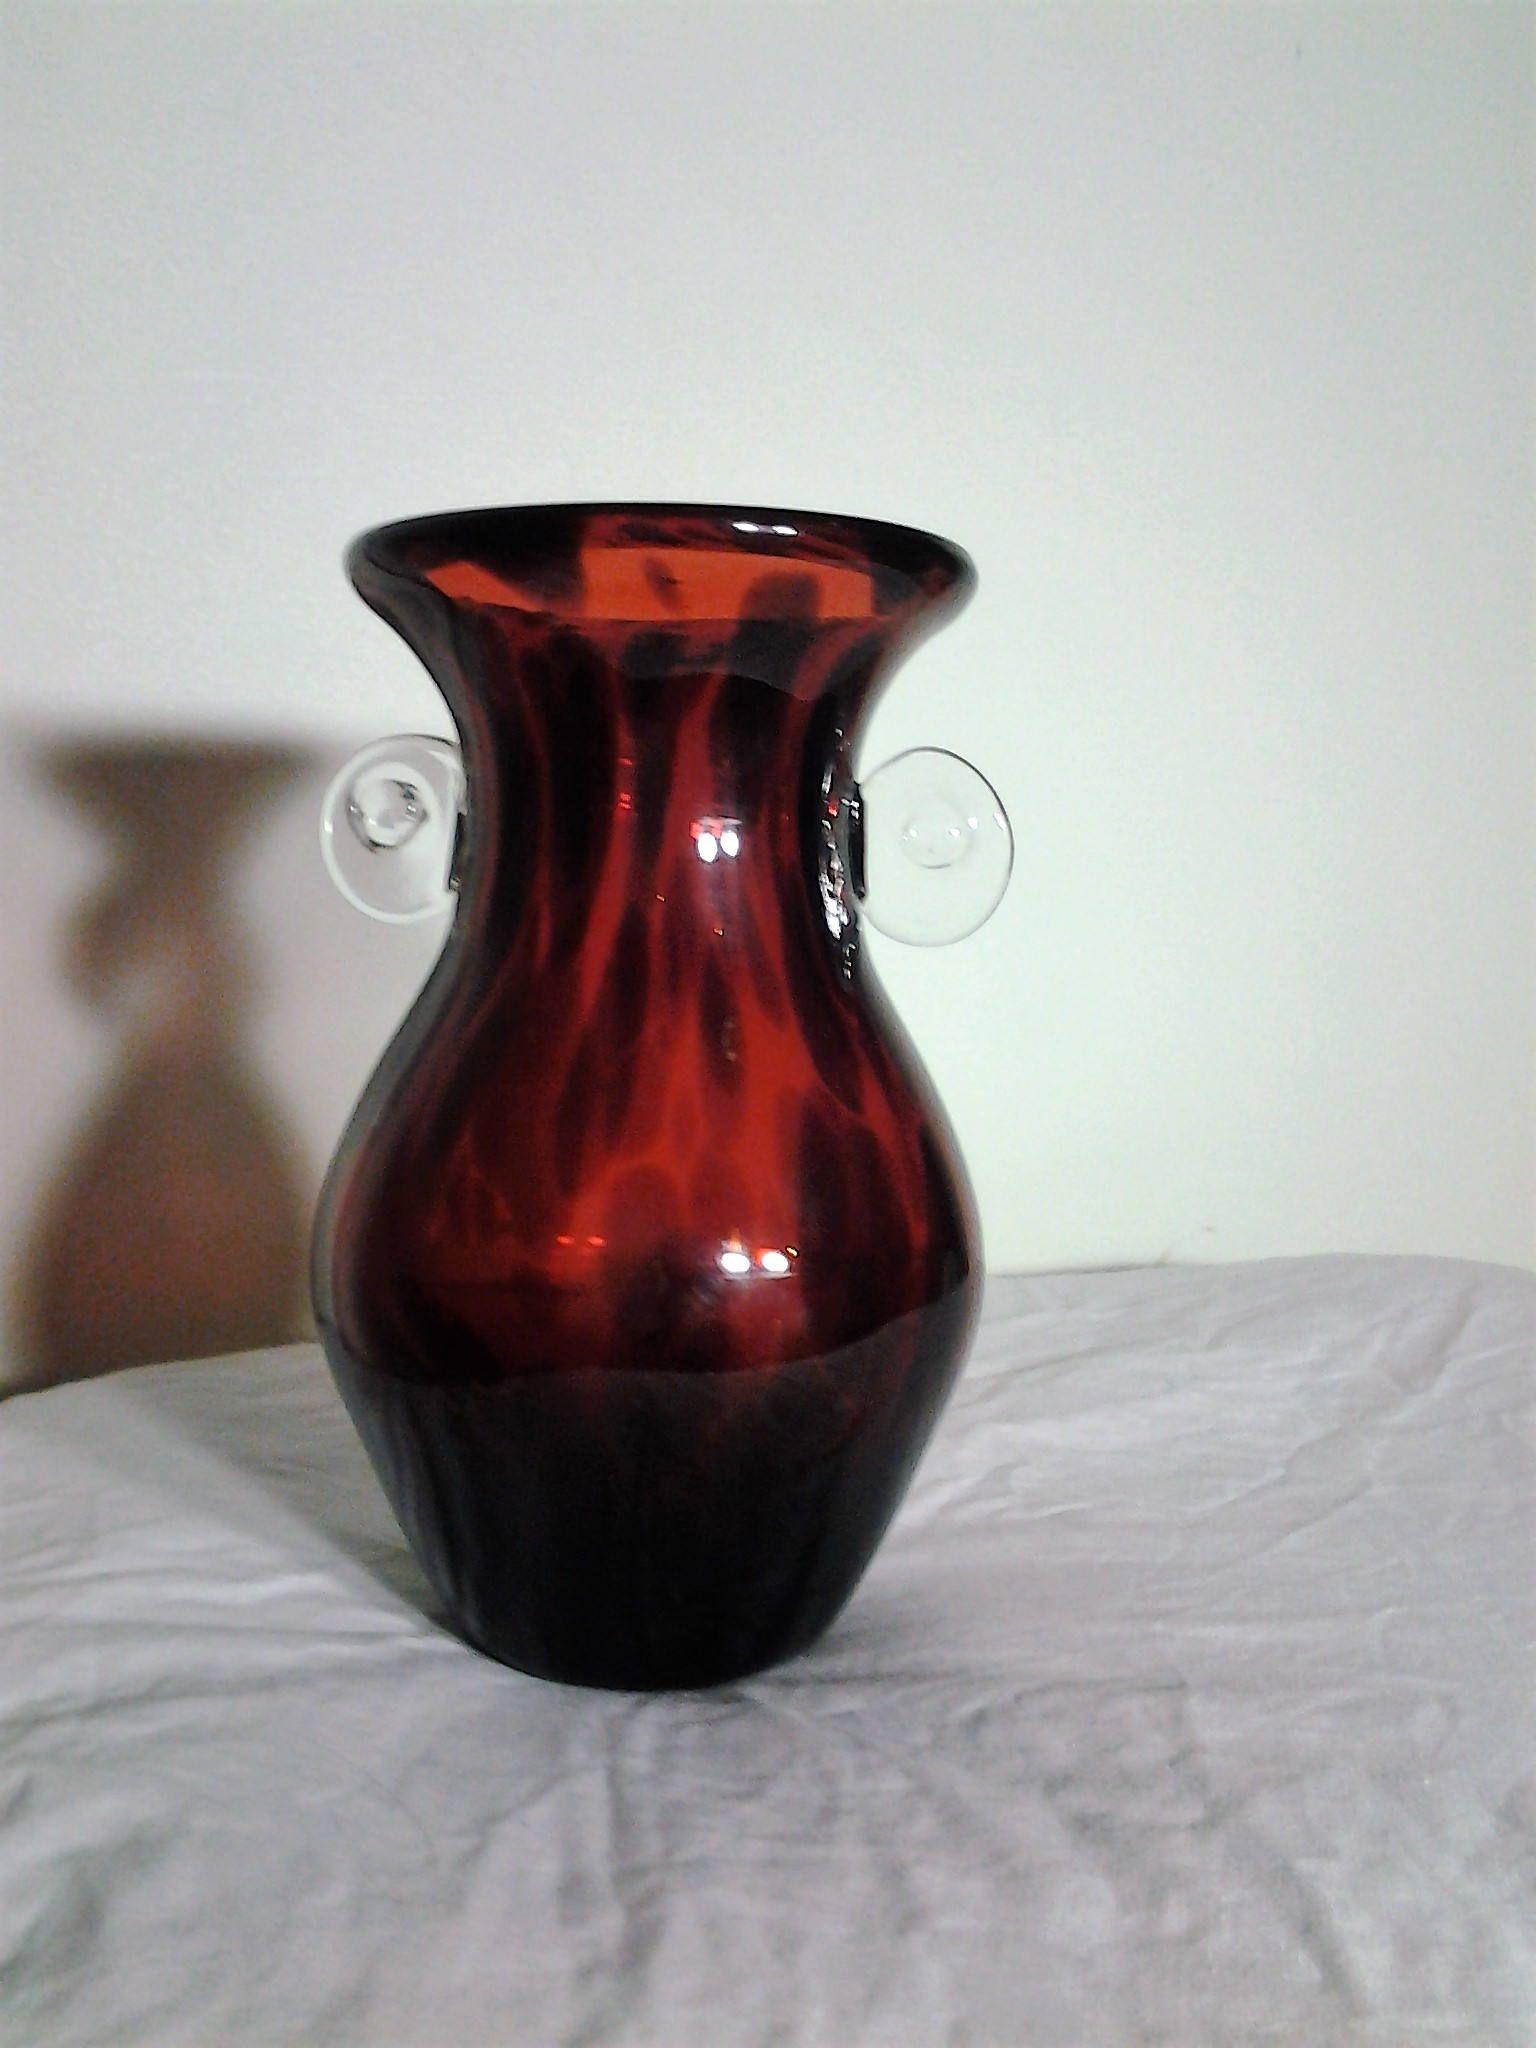 Pin by old vintage treasures on vintage vases for sale pinterest vintage red glass vase with dark spots and stripes reviewsmspy